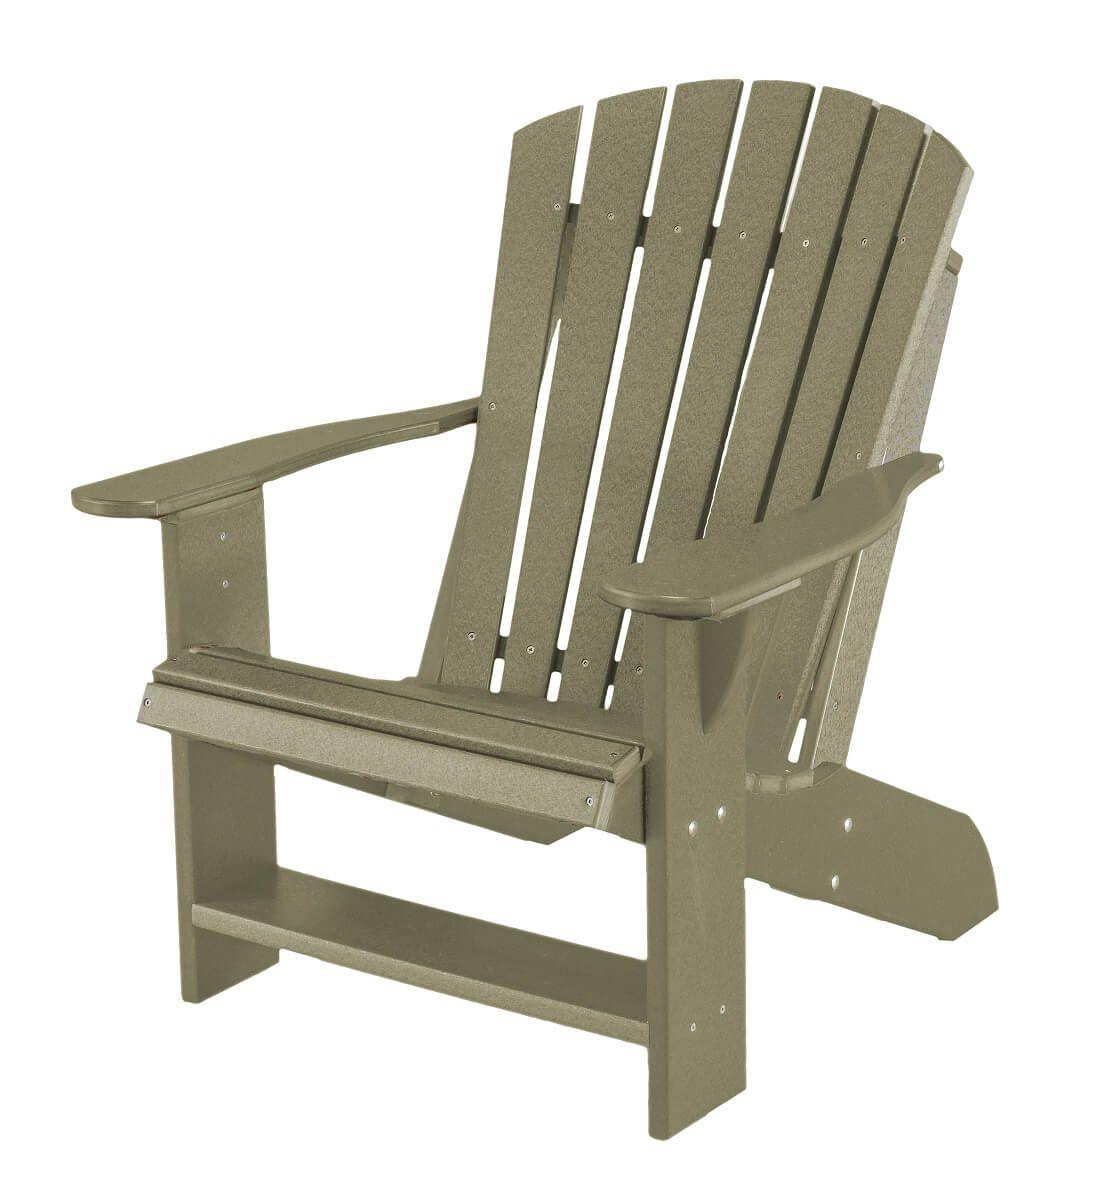 Olive Sidra Adirondack Chair